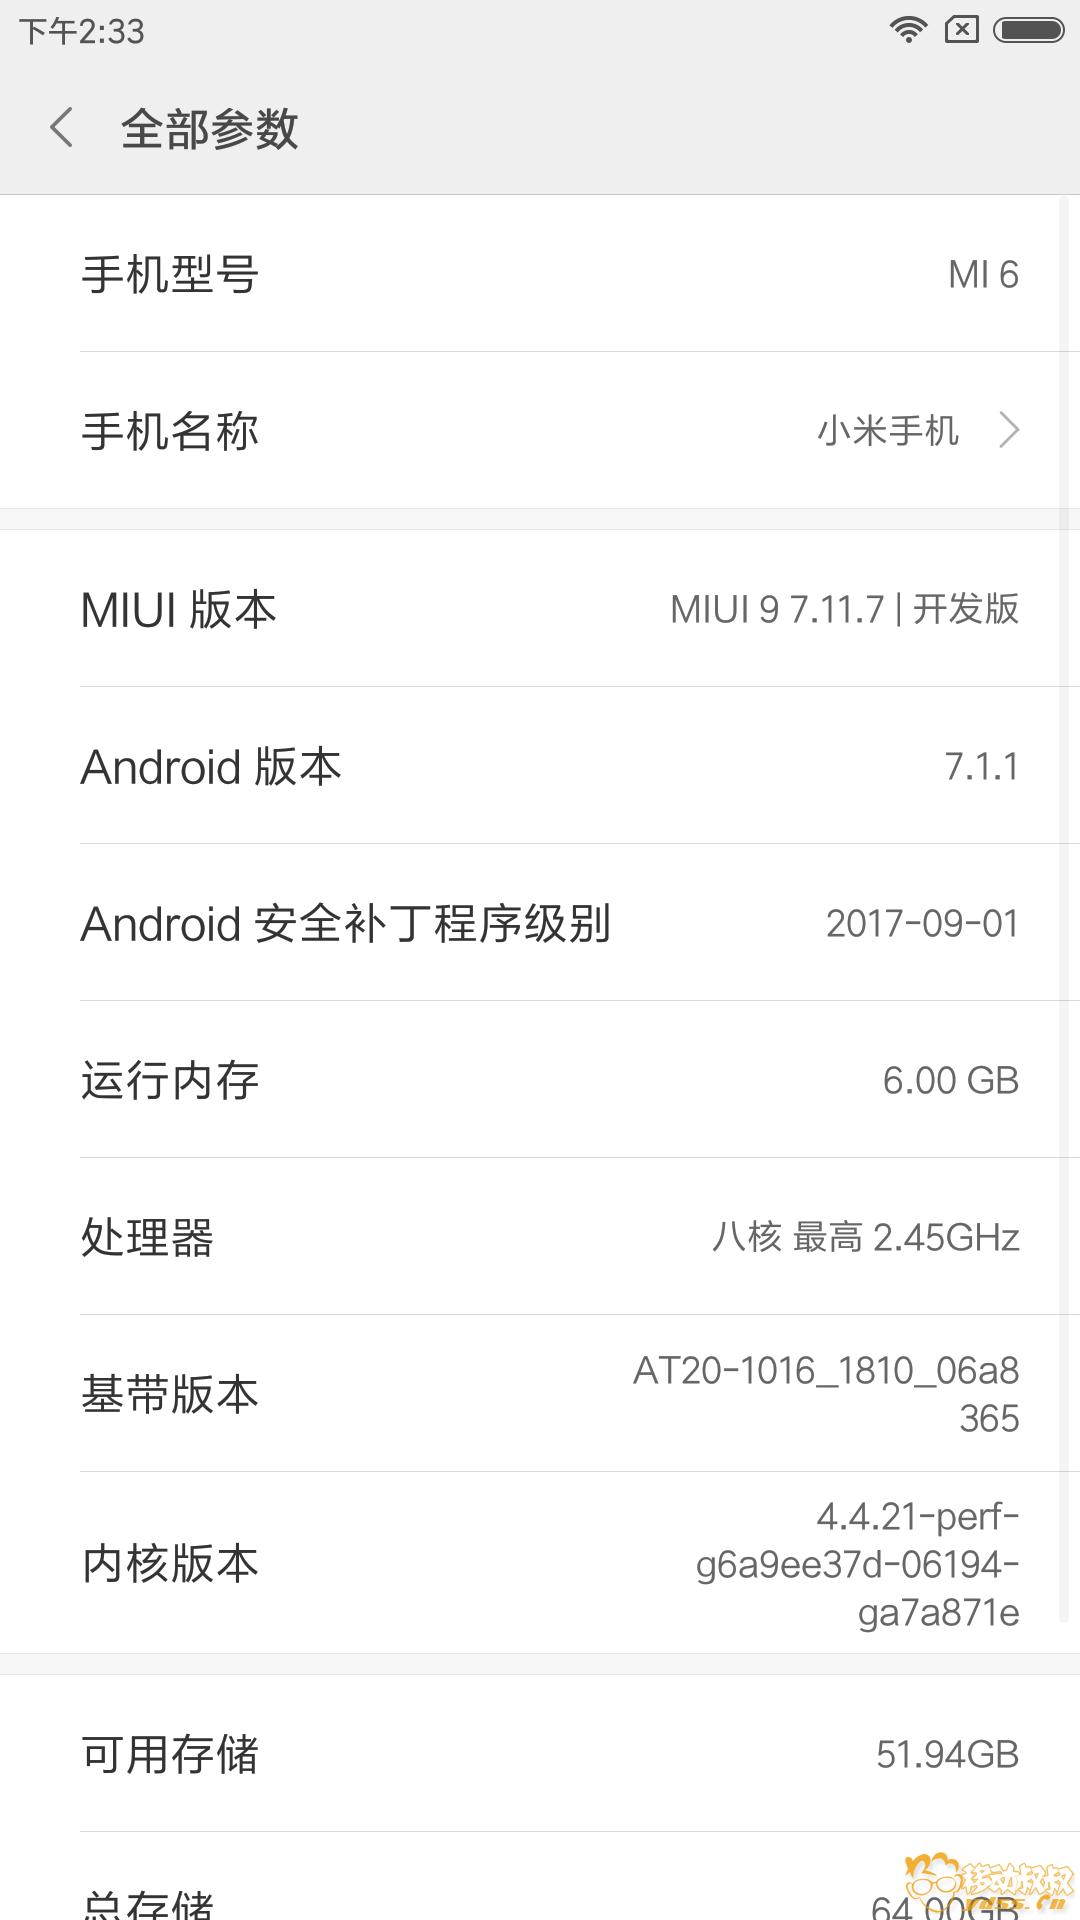 Screenshot_2017-11-07-14-33-59-963_com.android.settings.png